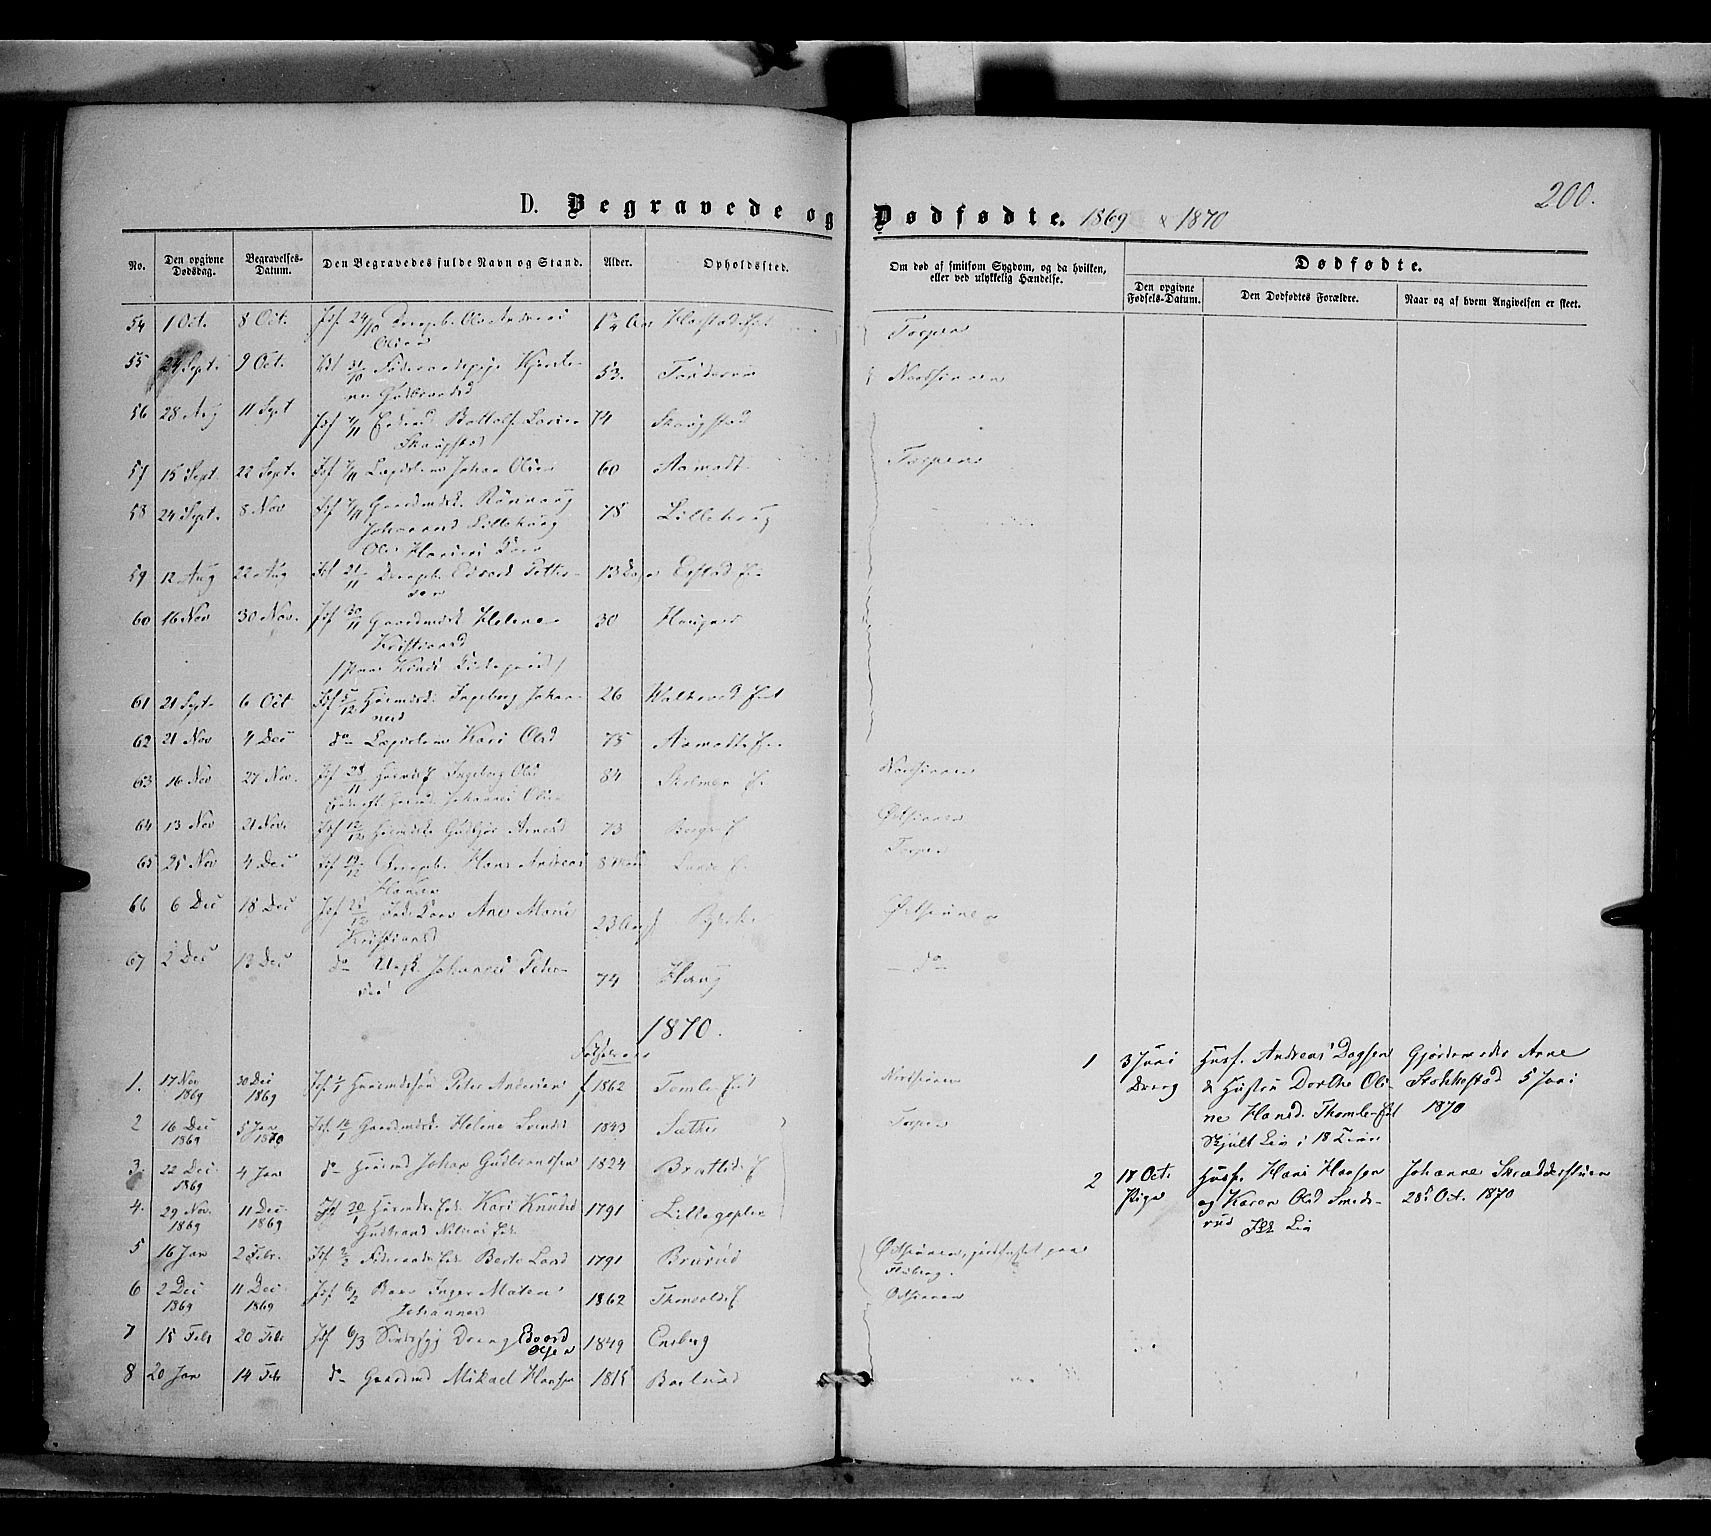 SAH, Nordre Land prestekontor, Ministerialbok nr. 1, 1860-1871, s. 200